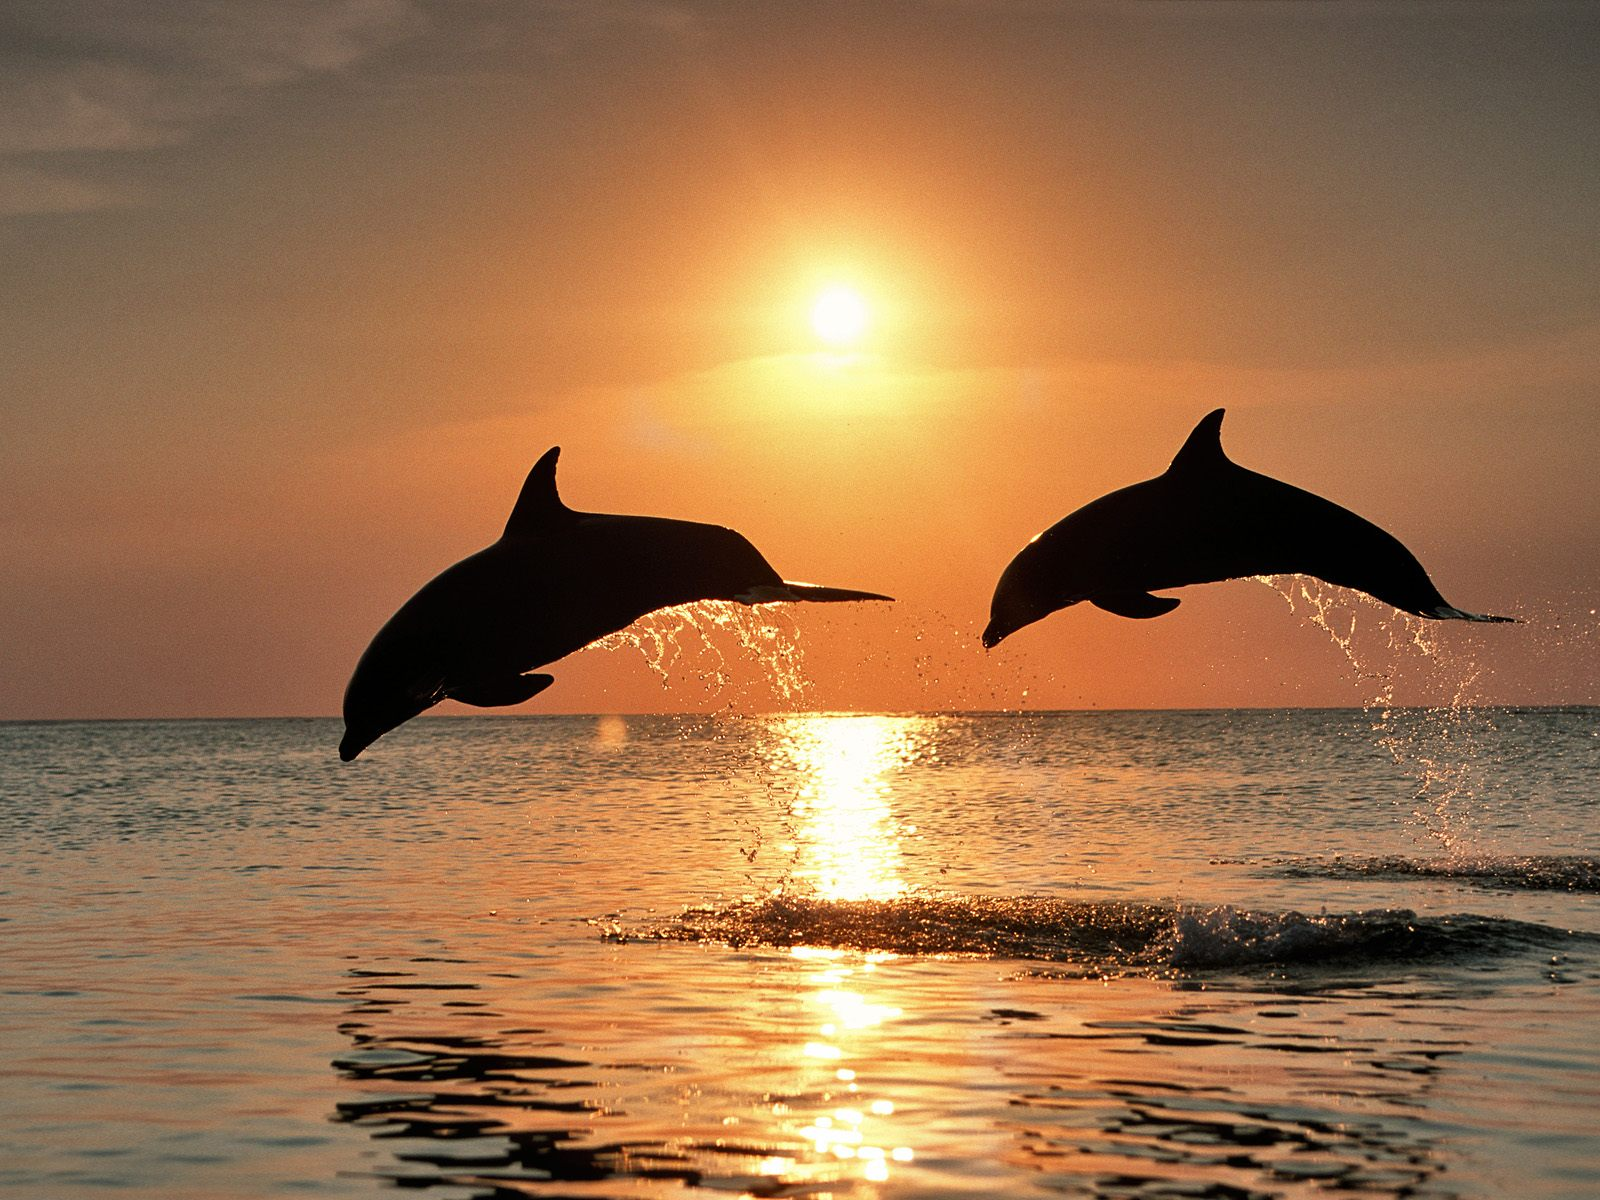 http://2.bp.blogspot.com/_MDIhQyBMEfw/S9RwumZdPZI/AAAAAAAADDc/DZ50Nlt9t10/s1600/bottlenose+dolphins.jpg